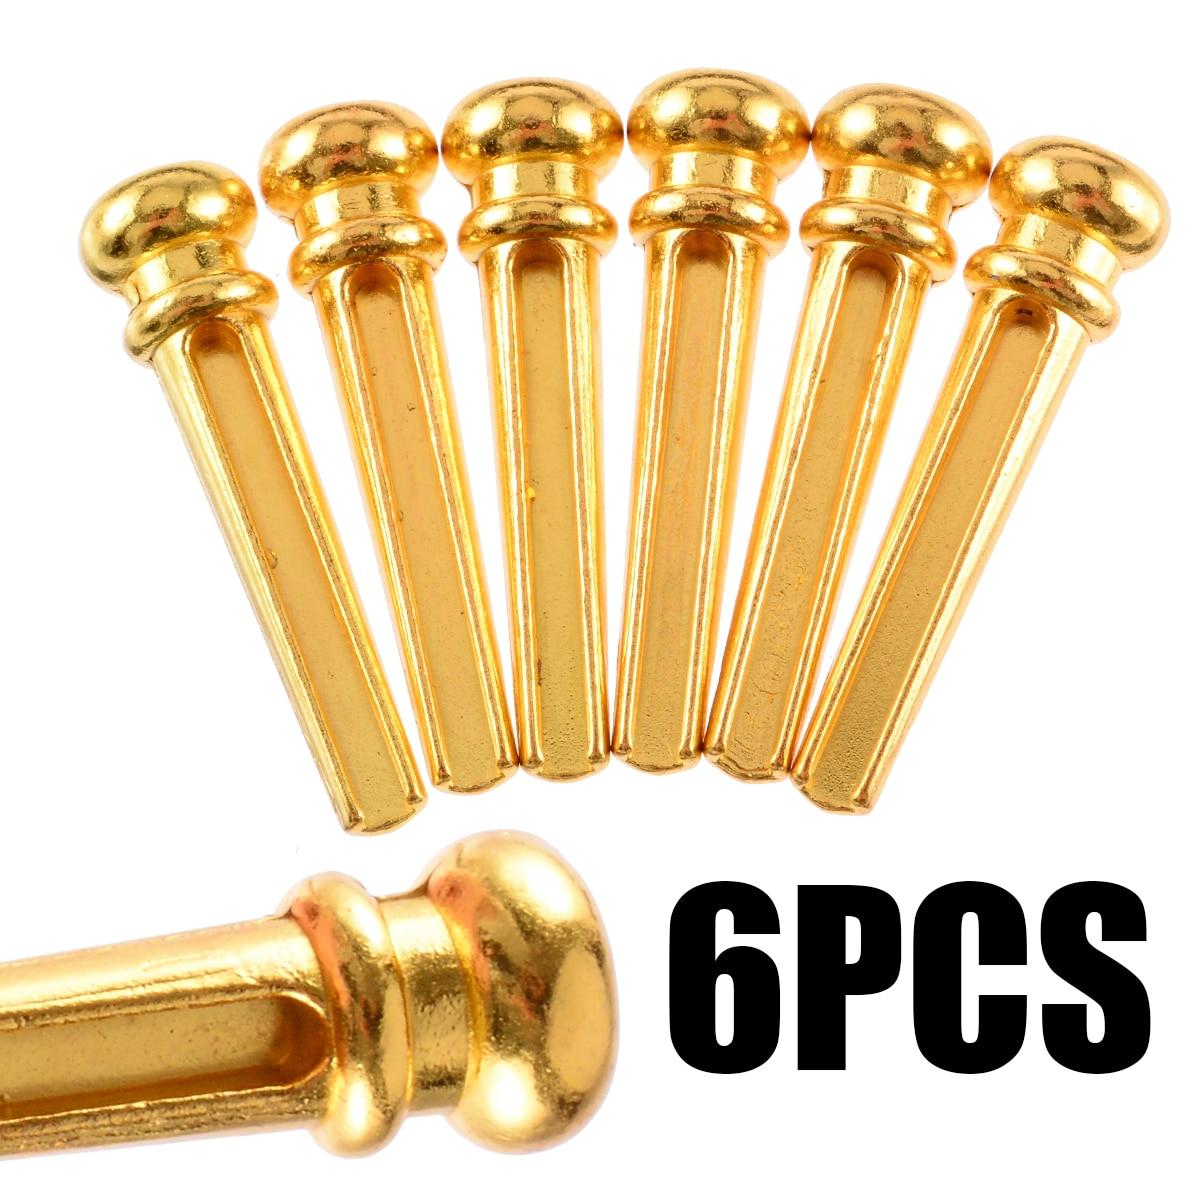 6Pcs Guitar Bridge Pins With Brass String Nails Pin Folk Acoustic Classical Guitar Solid String Bridge Pins